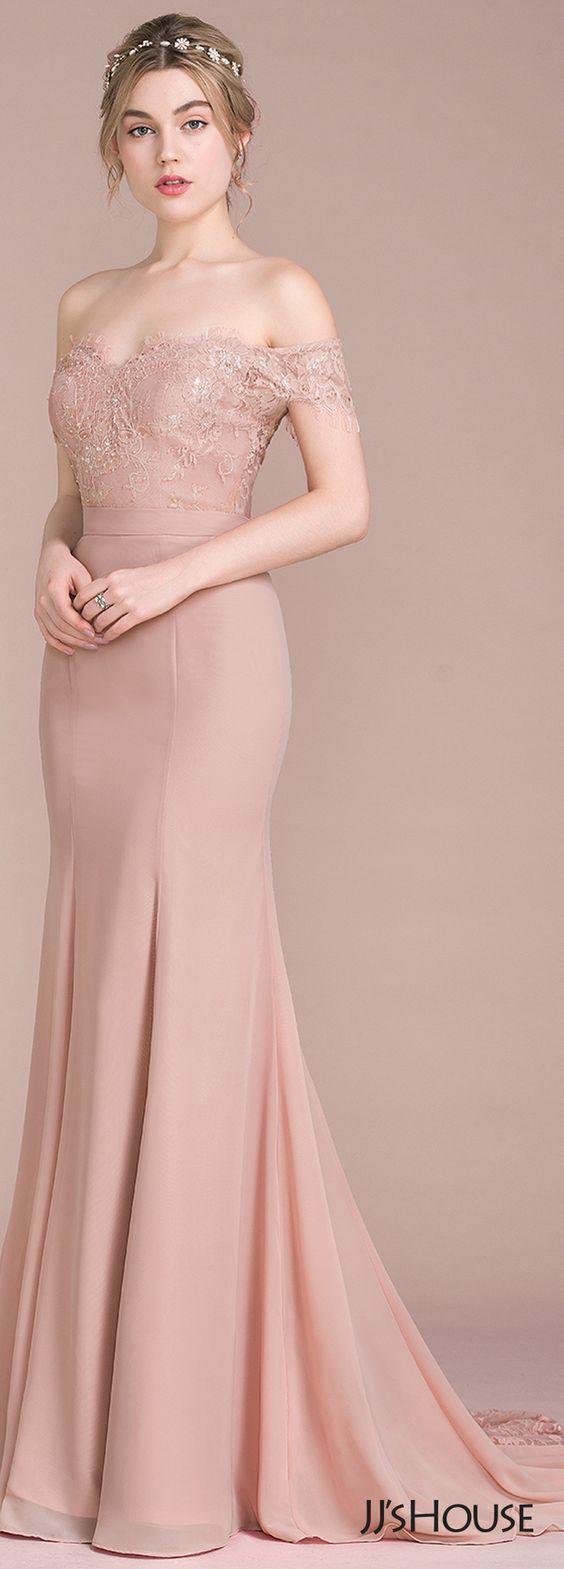 JJsHouse #Bridesmaid  Lace bridesmaid dresses, Prom dresses long